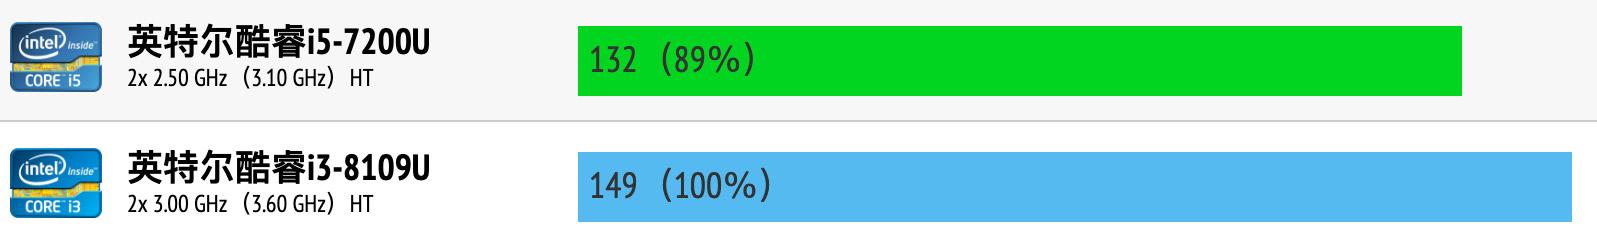 Intel Core i5-7200U和i3-8109U性能跑分对比评测